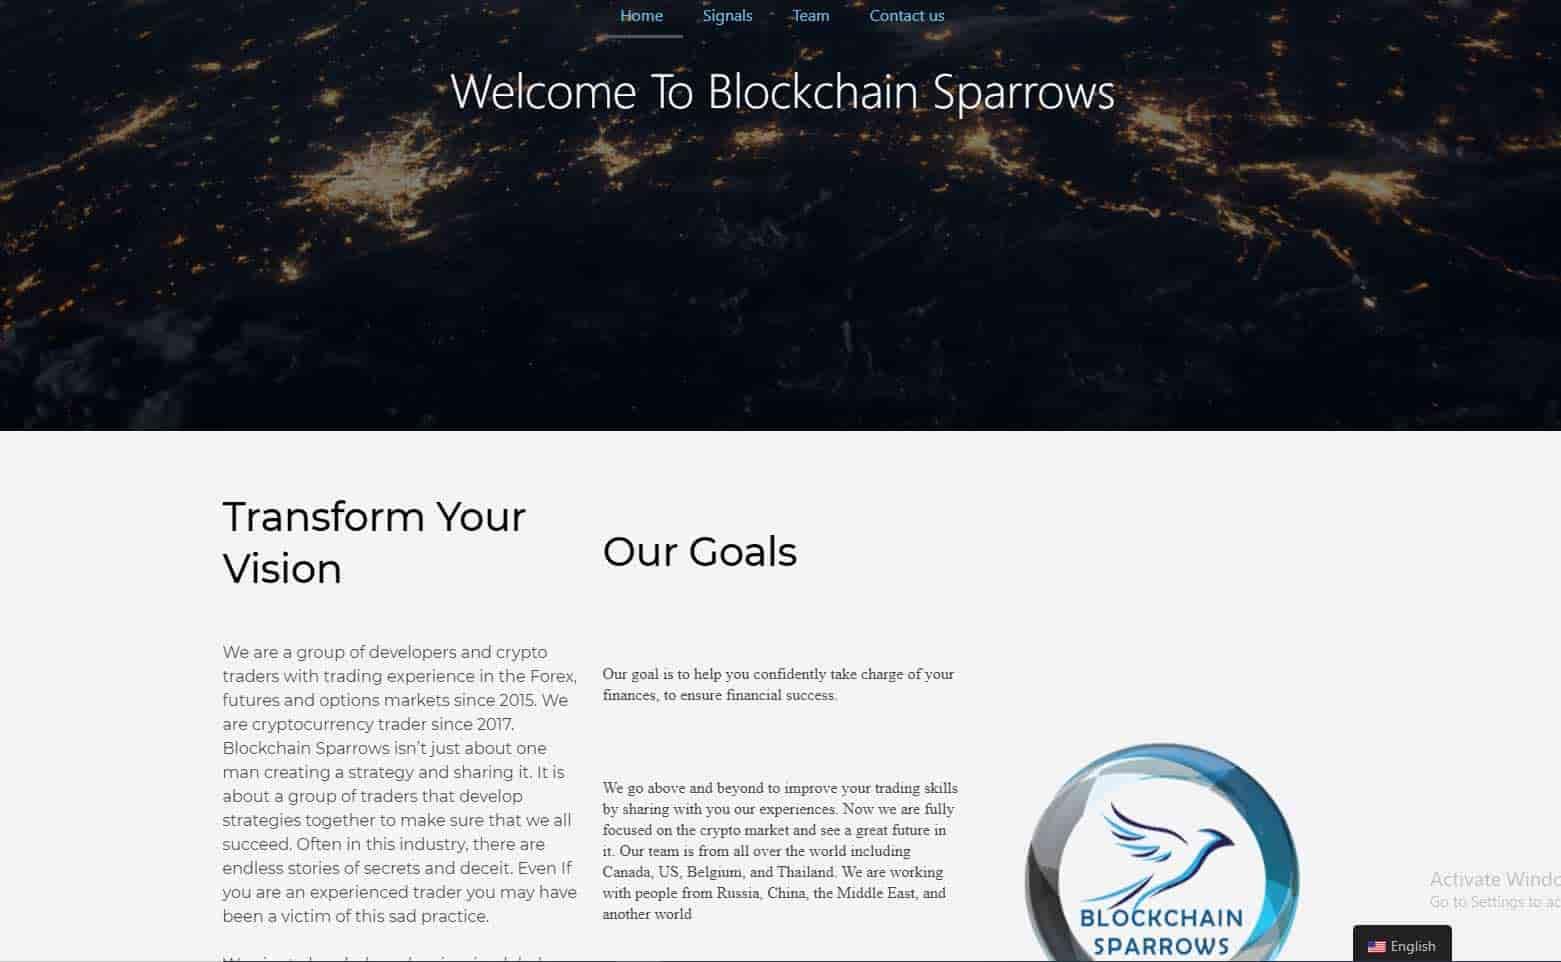 blockchain sparrows signals